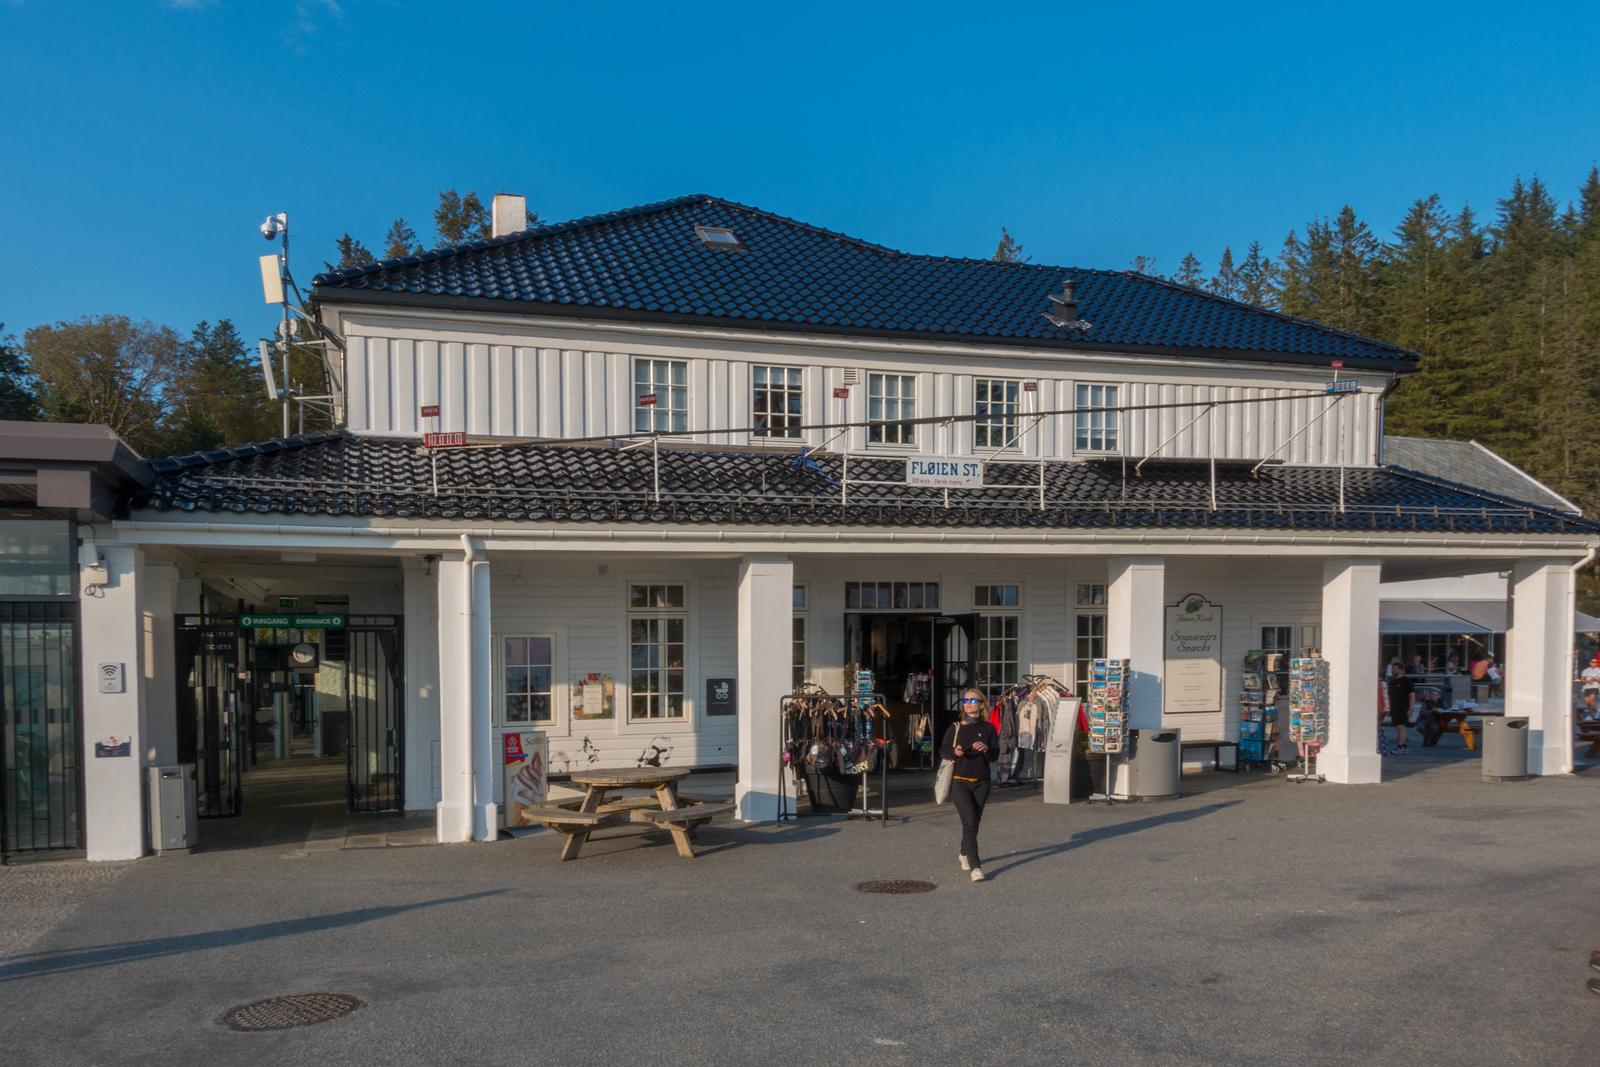 Funicular in Bergen, Norway